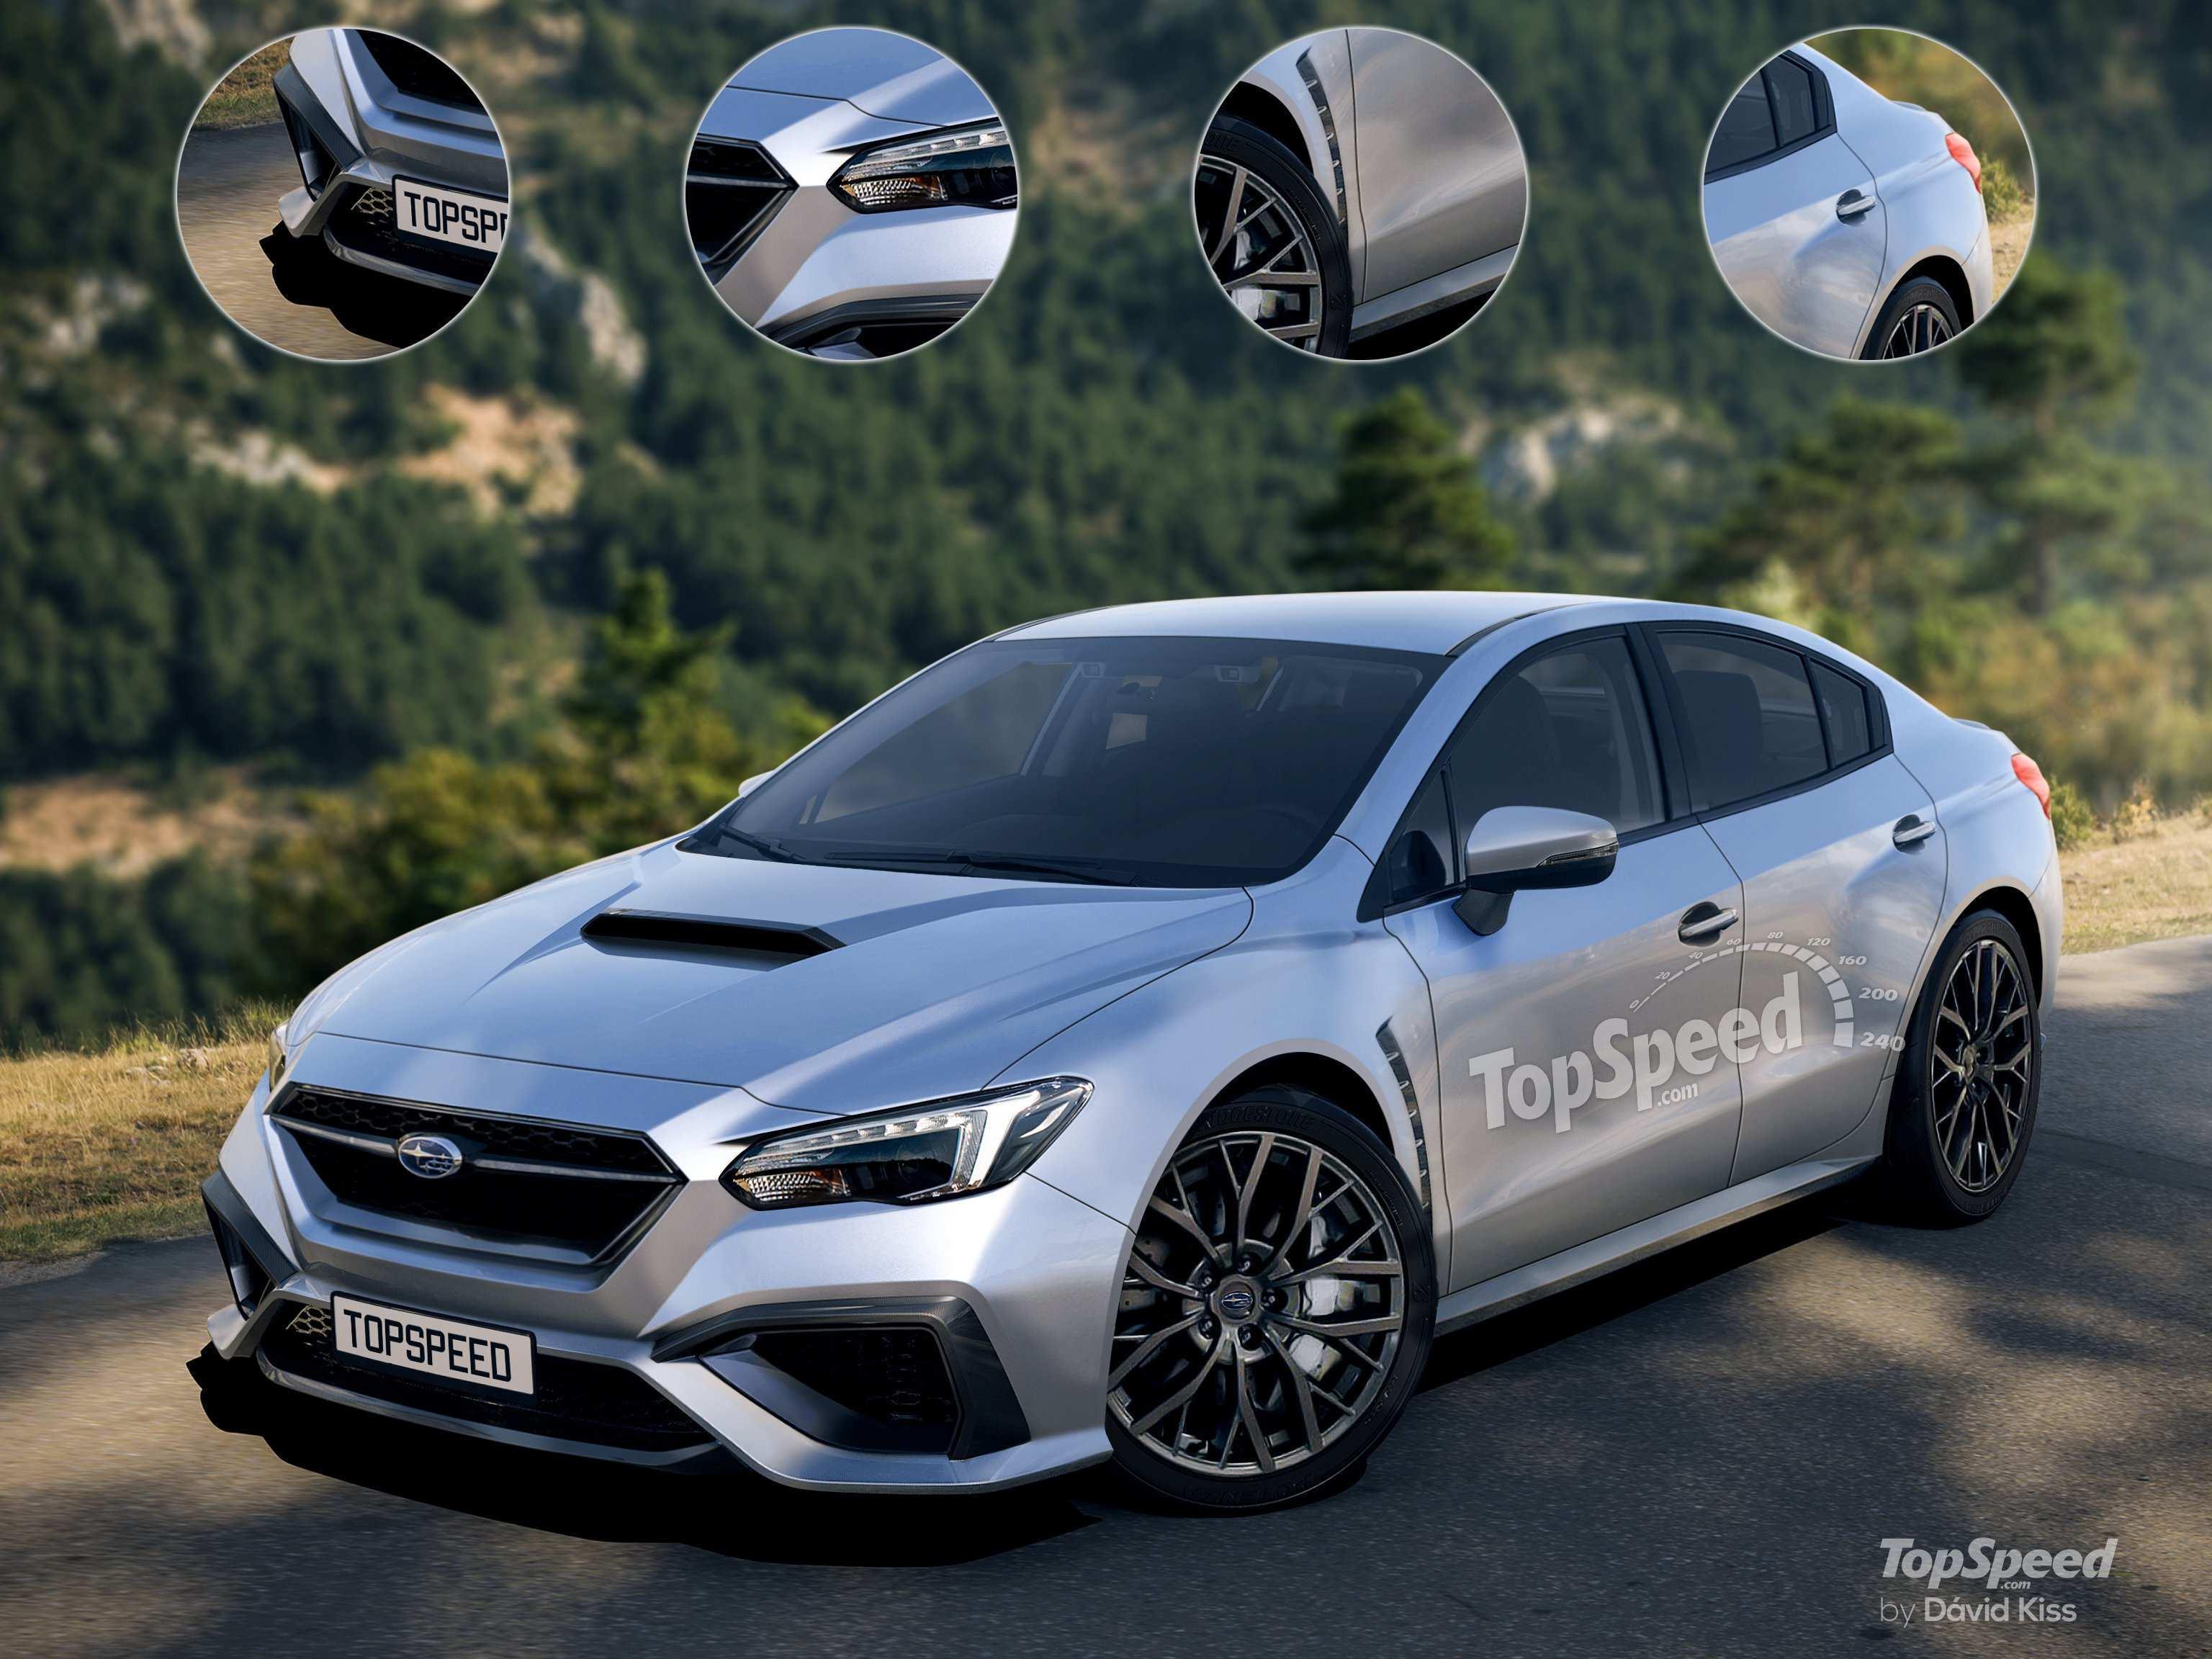 15 Concept of 2020 Subaru Wrx Sti Hatchback Performance and New Engine with 2020 Subaru Wrx Sti Hatchback